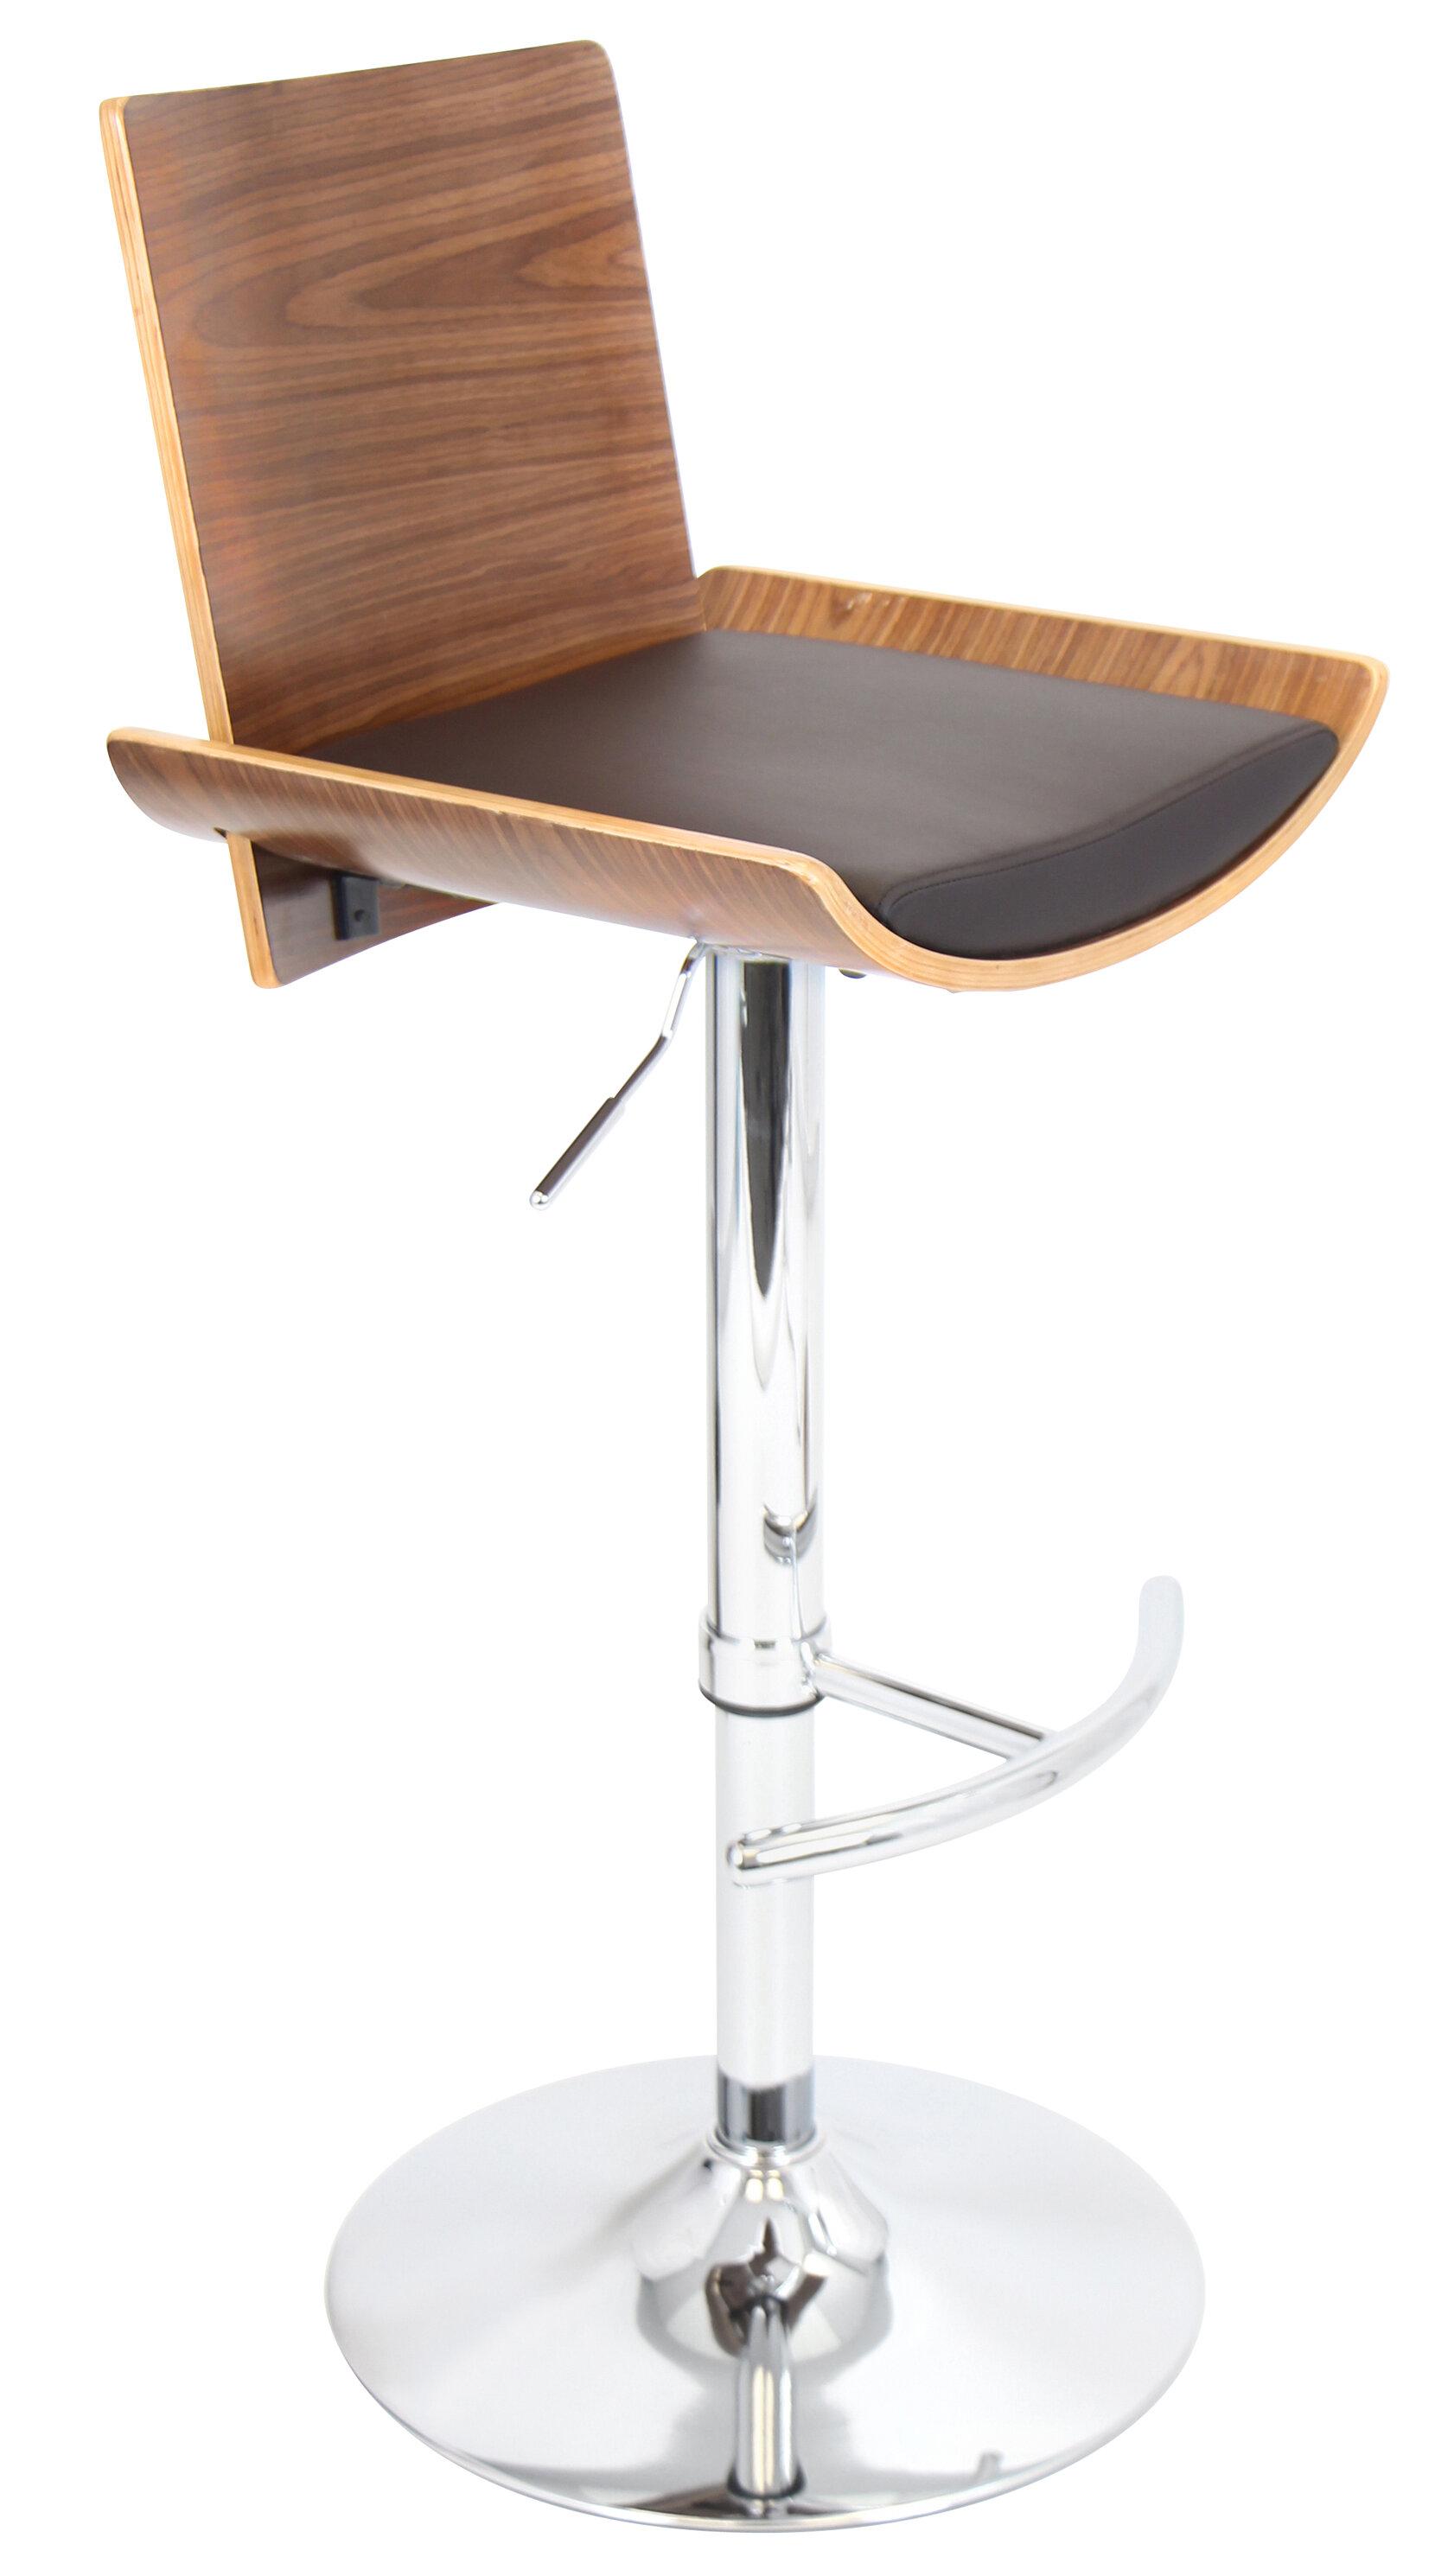 Outstanding Wade Logan Screven Adjustable Height Swivel Bar Stool Andrewgaddart Wooden Chair Designs For Living Room Andrewgaddartcom